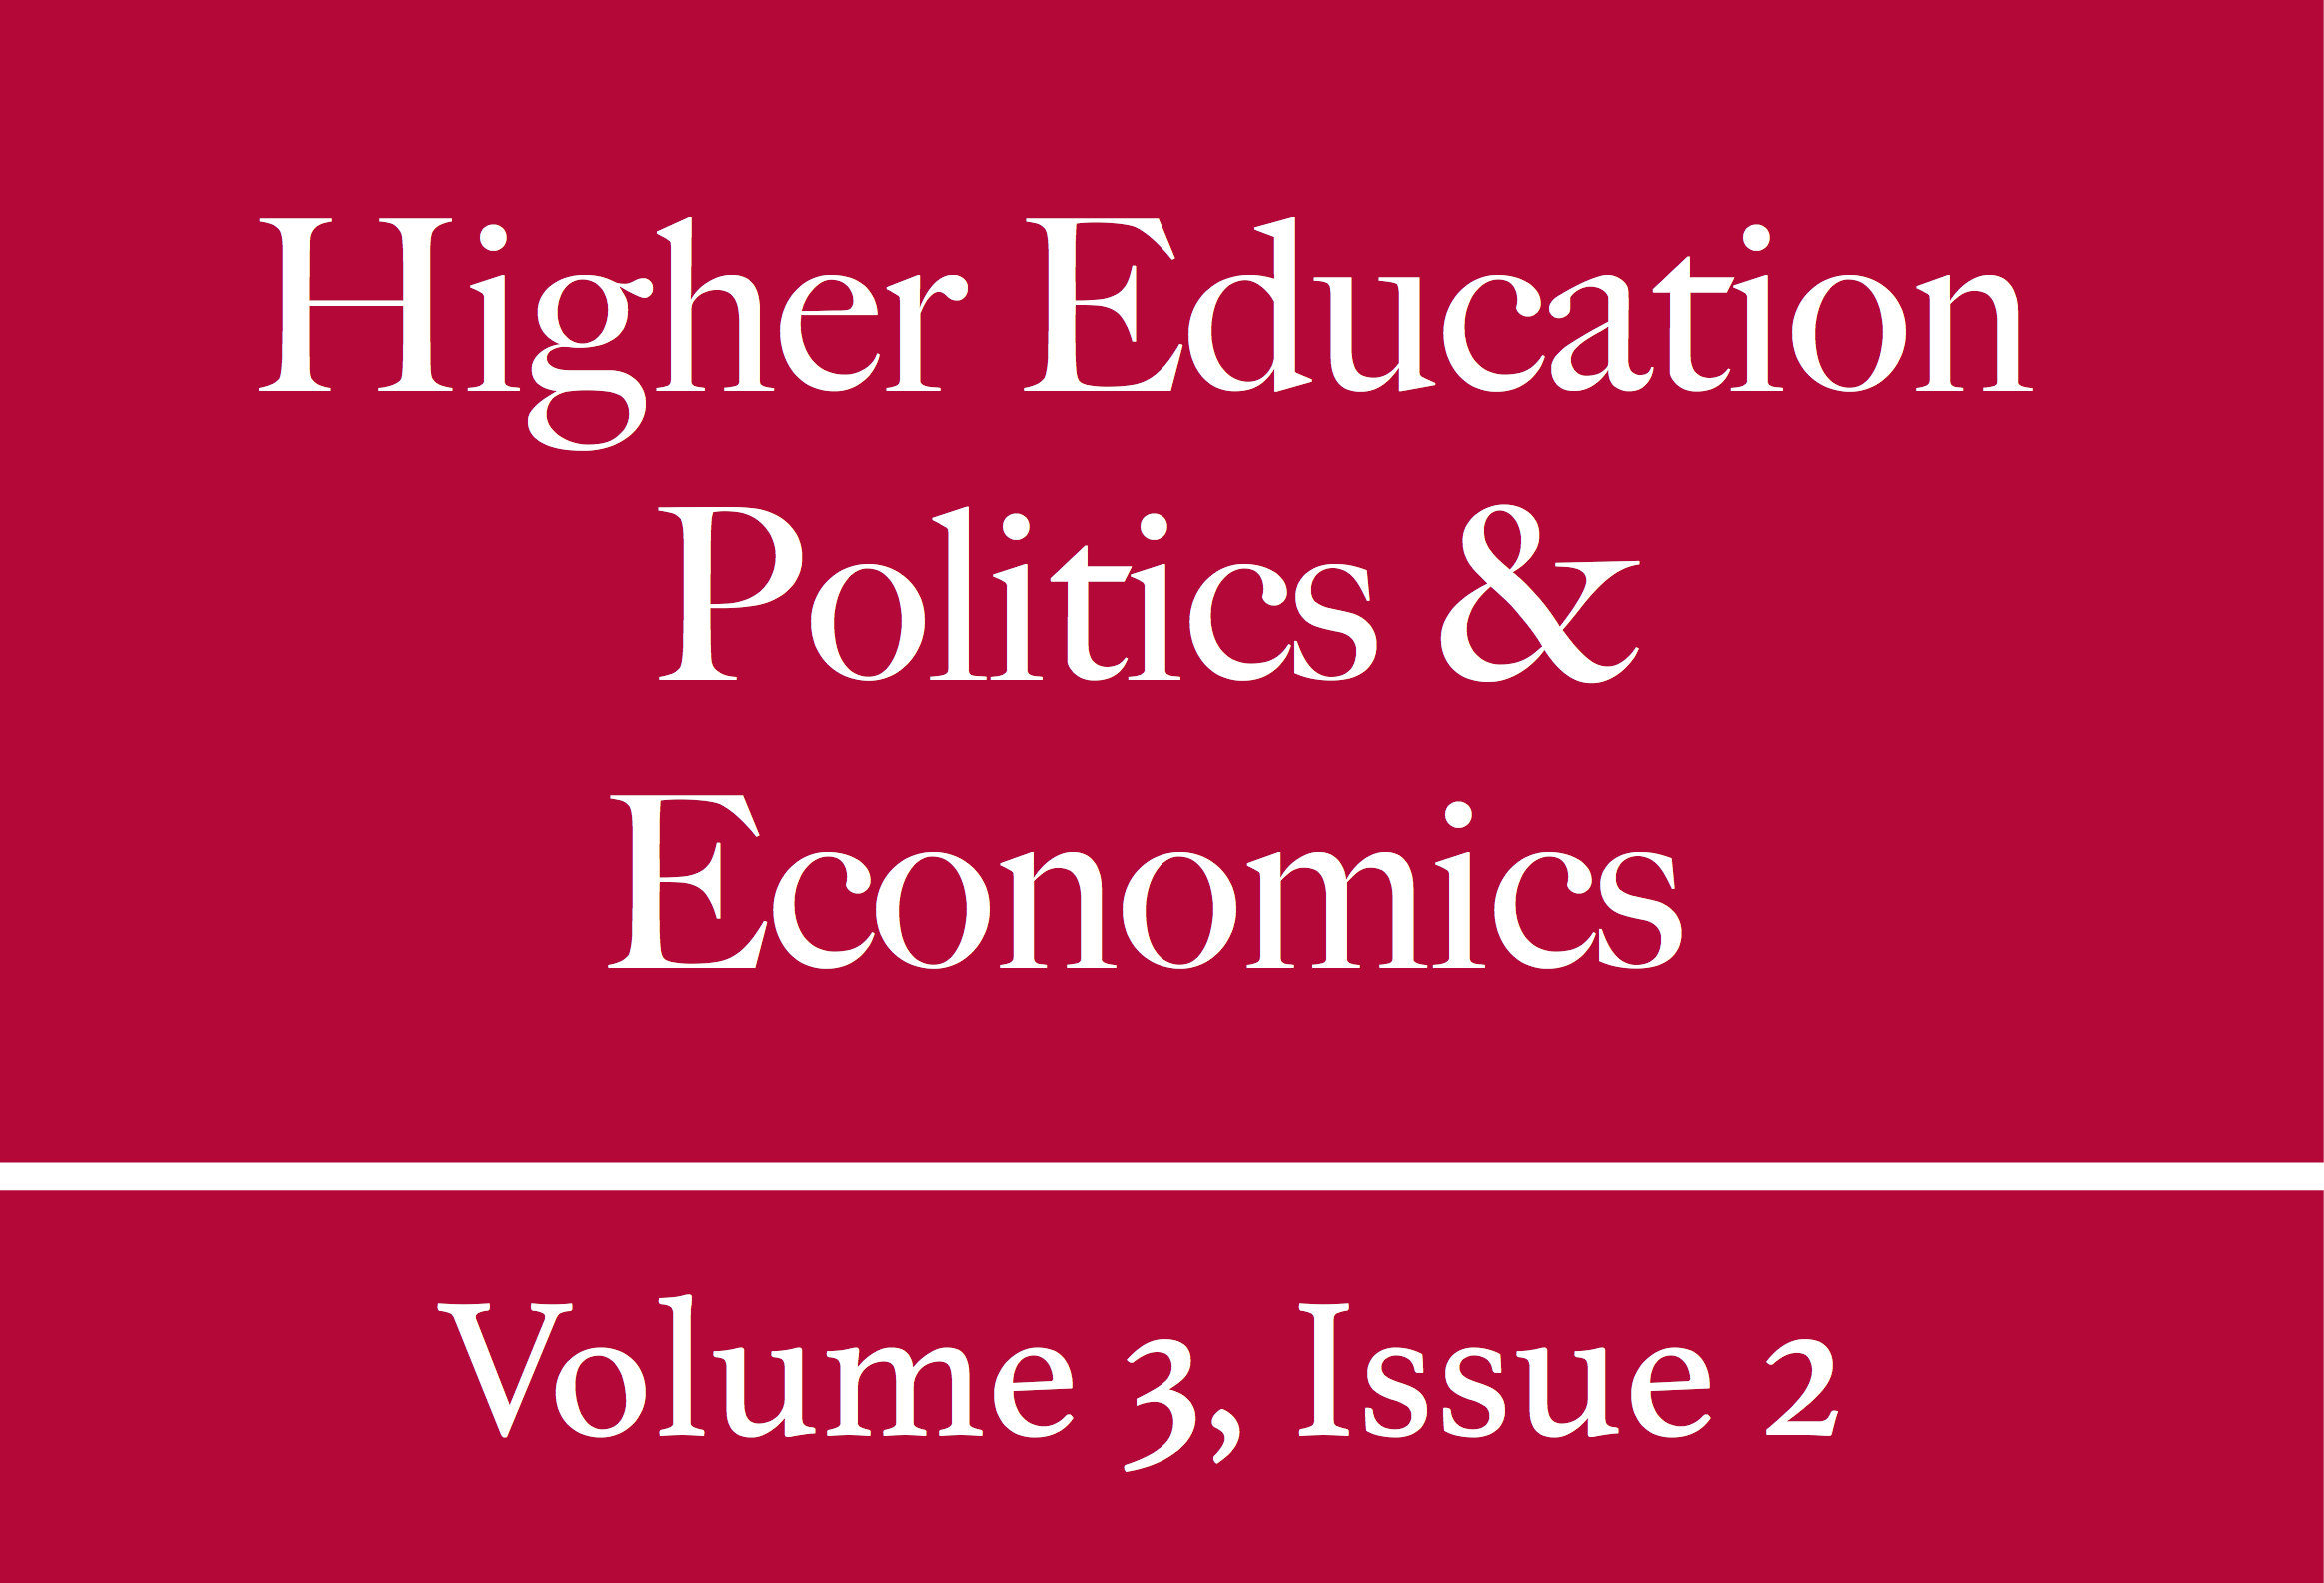 HEPE Volume 3, Issue 2